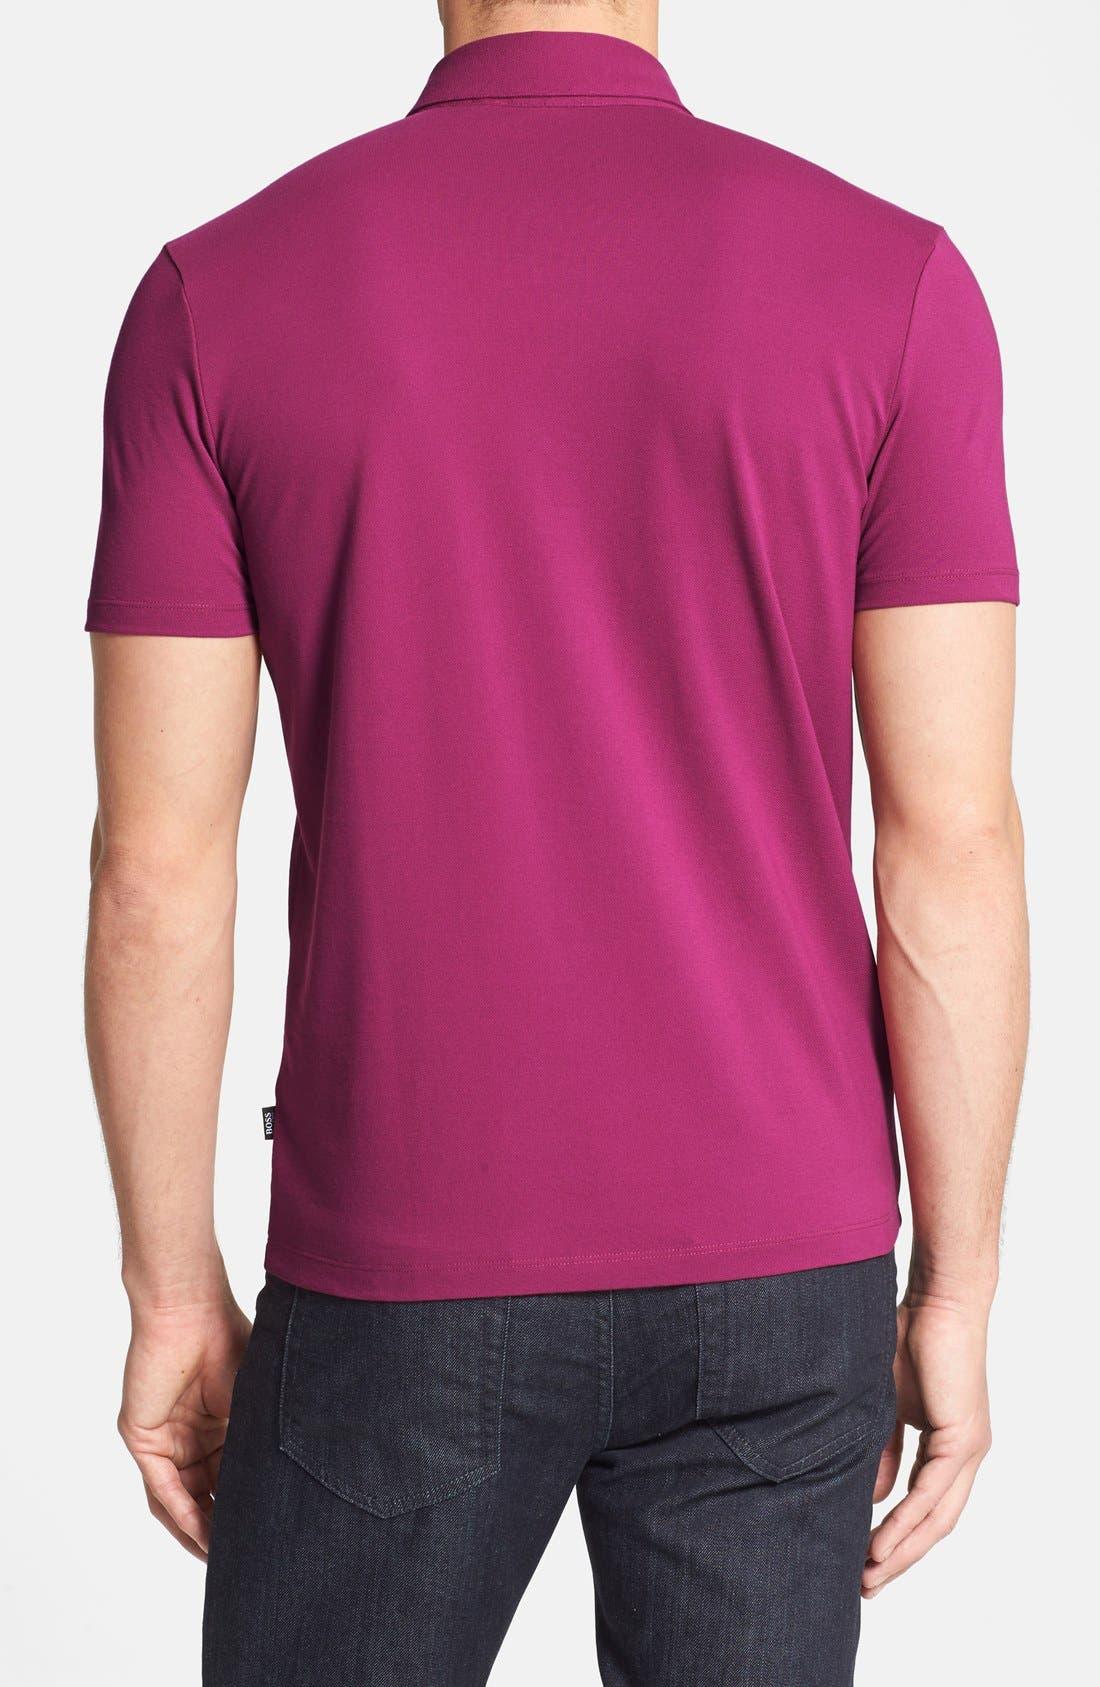 HUGO BOSS 'Firenze 43' Regular Fit Jersey Polo,                             Alternate thumbnail 2, color,                             Berry